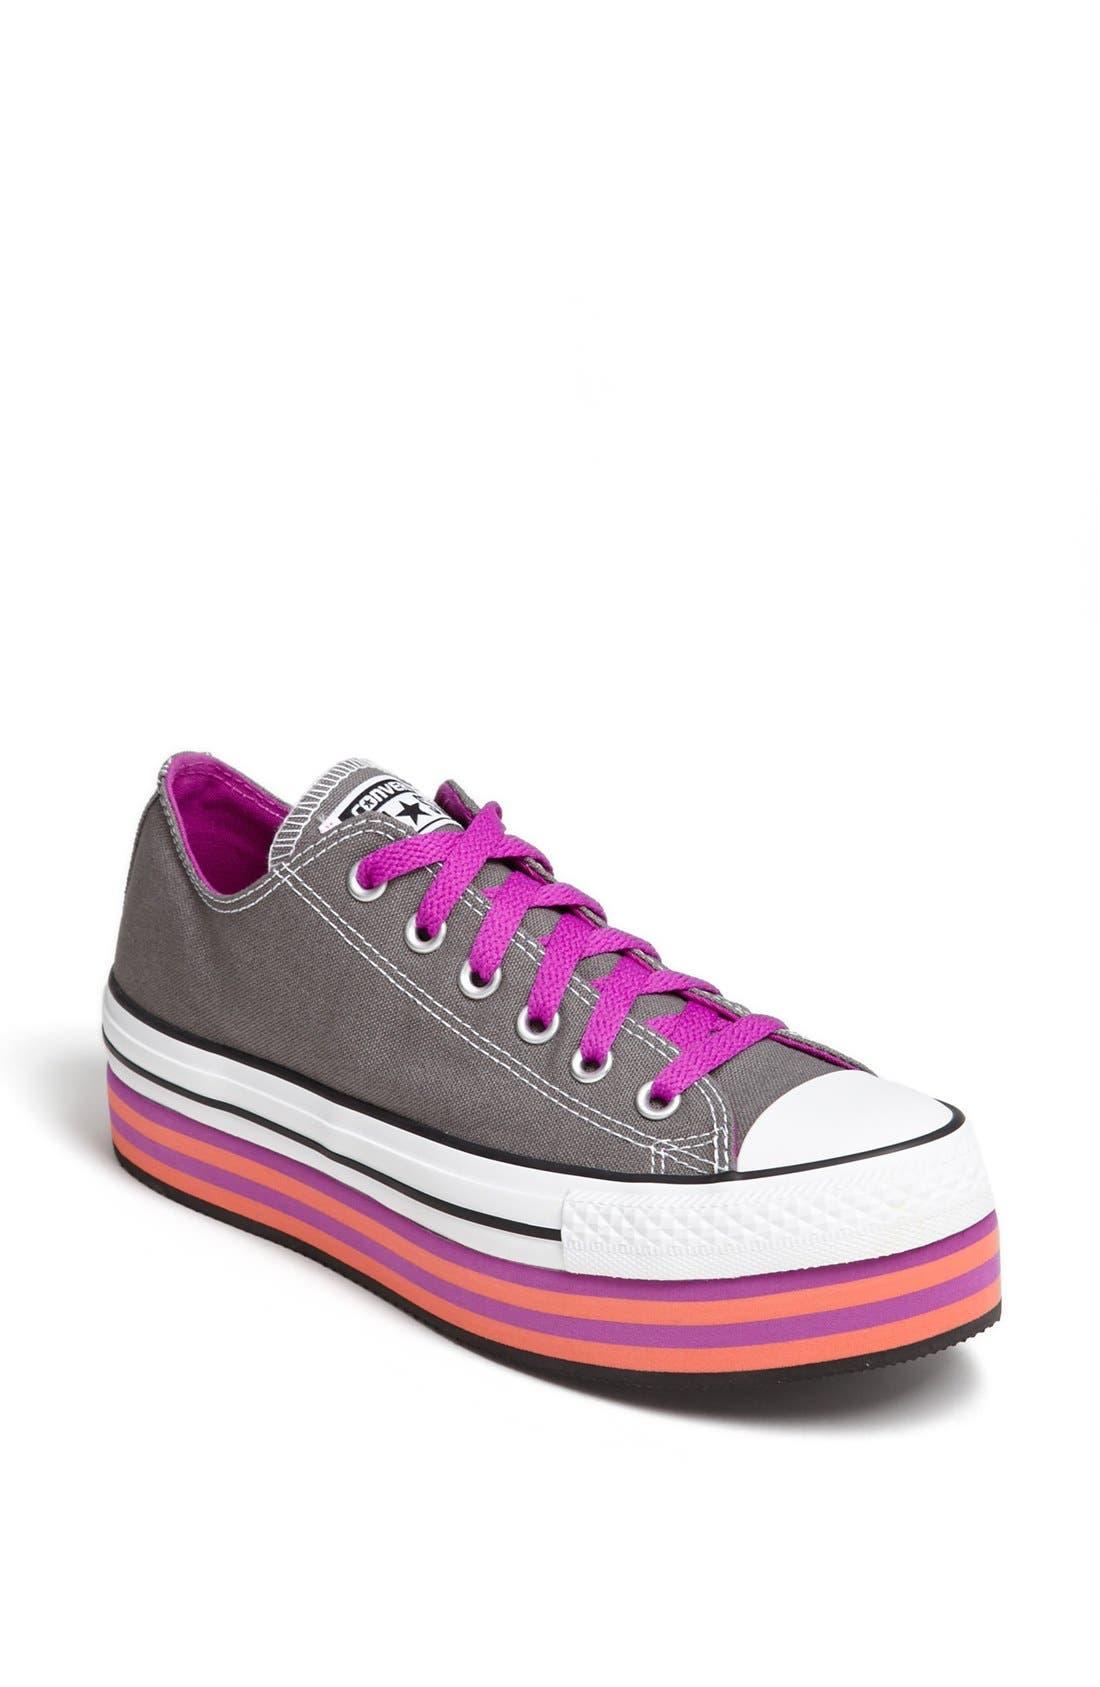 Alternate Image 1 Selected - Converse Chuck Taylor® All Star® Platform Sneaker (Women)